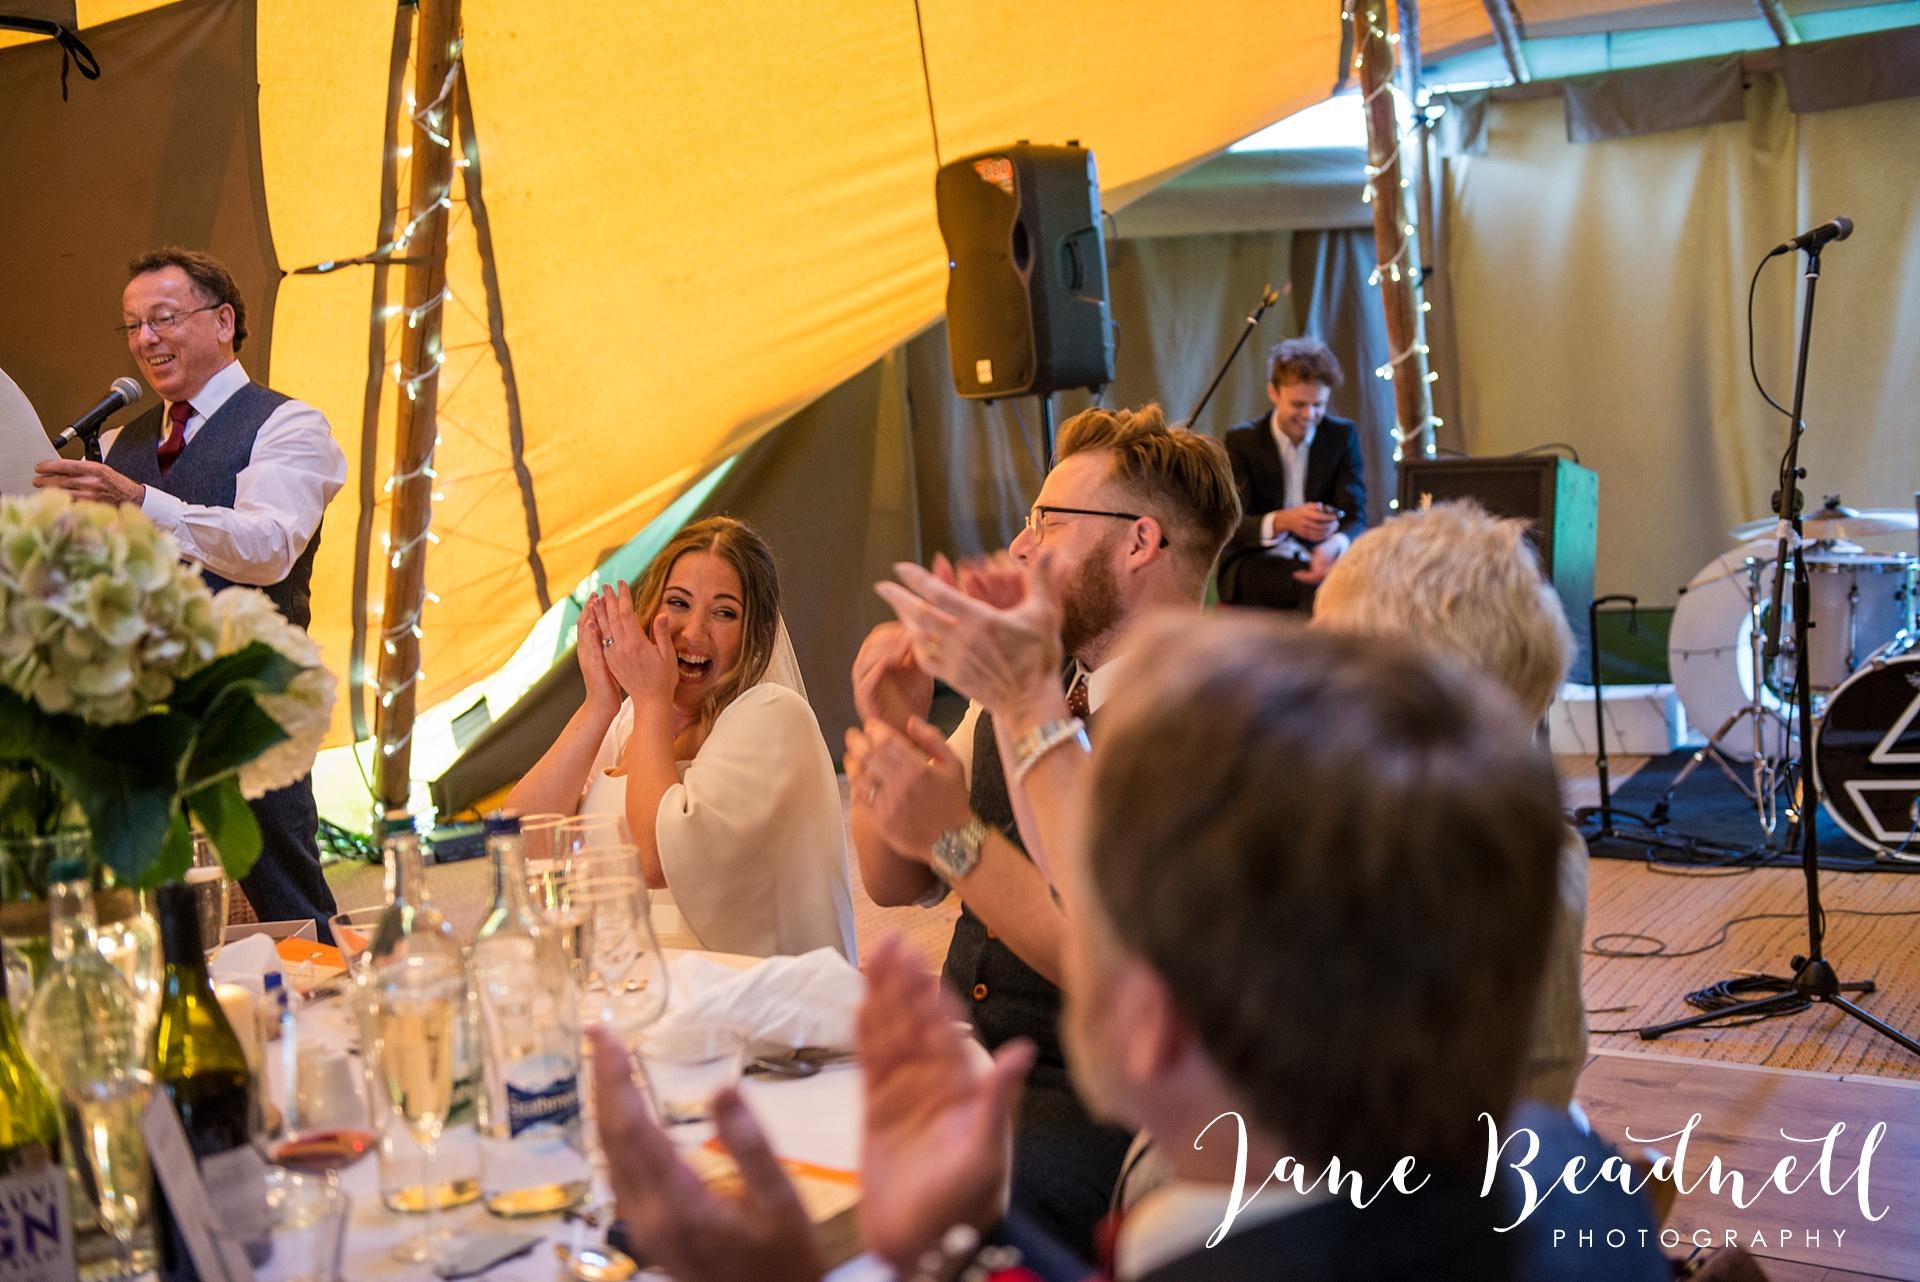 fine-art-wedding-photographer-jane-beadnell-yorkshire-wedding-photographer_0130